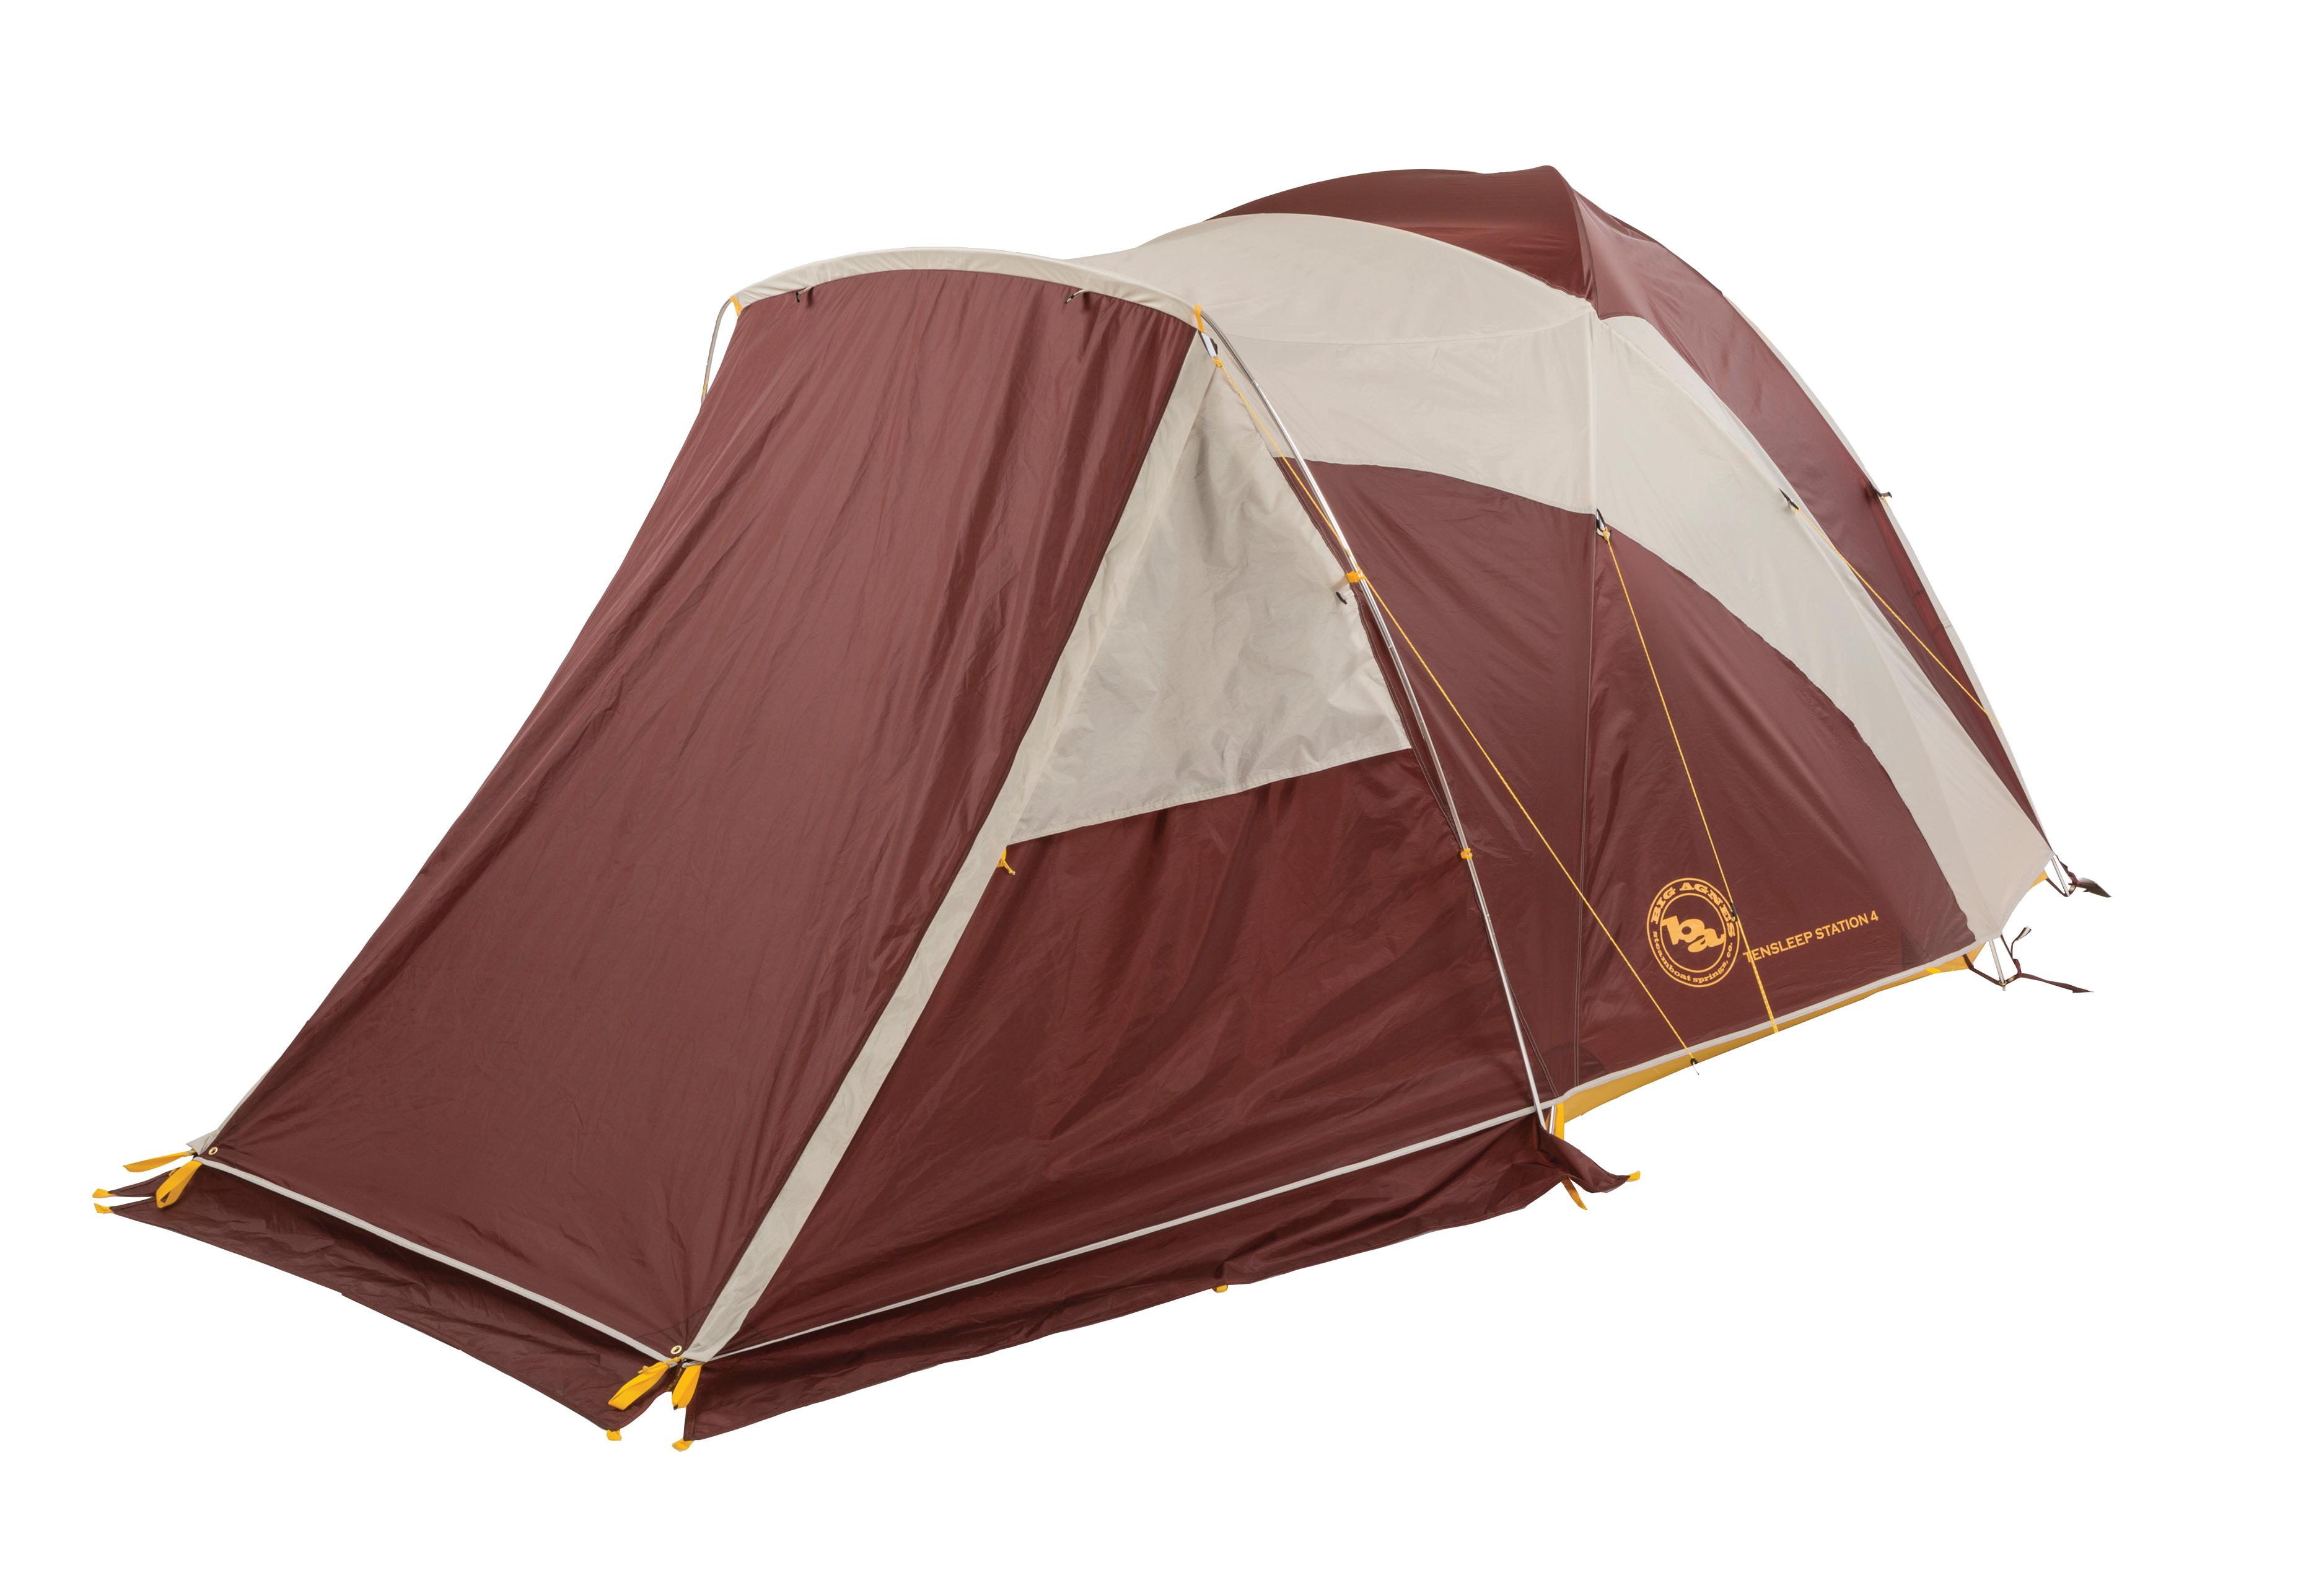 sc 1 st  MEC & Big Agnes Tensleep Station 6 Tent